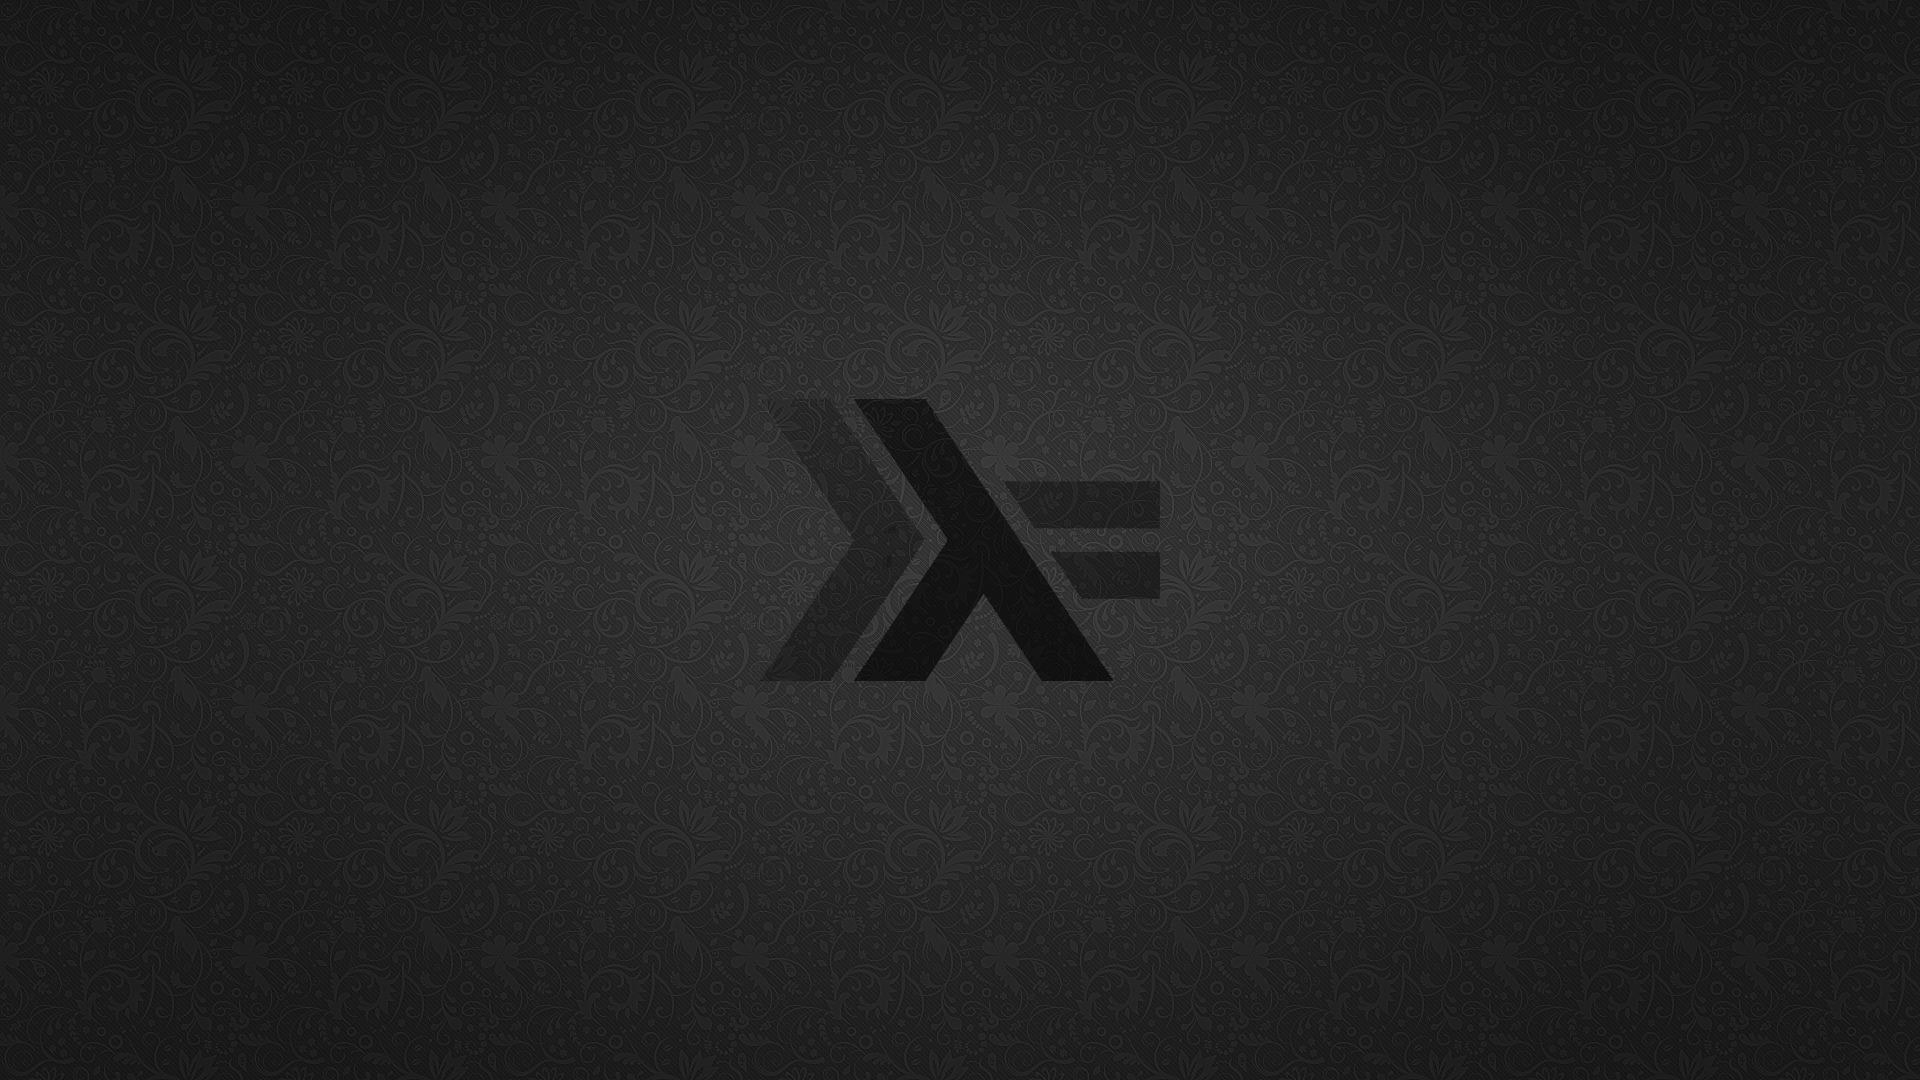 lambda dark background programming wallpaper   ForWallpapercom 1920x1080